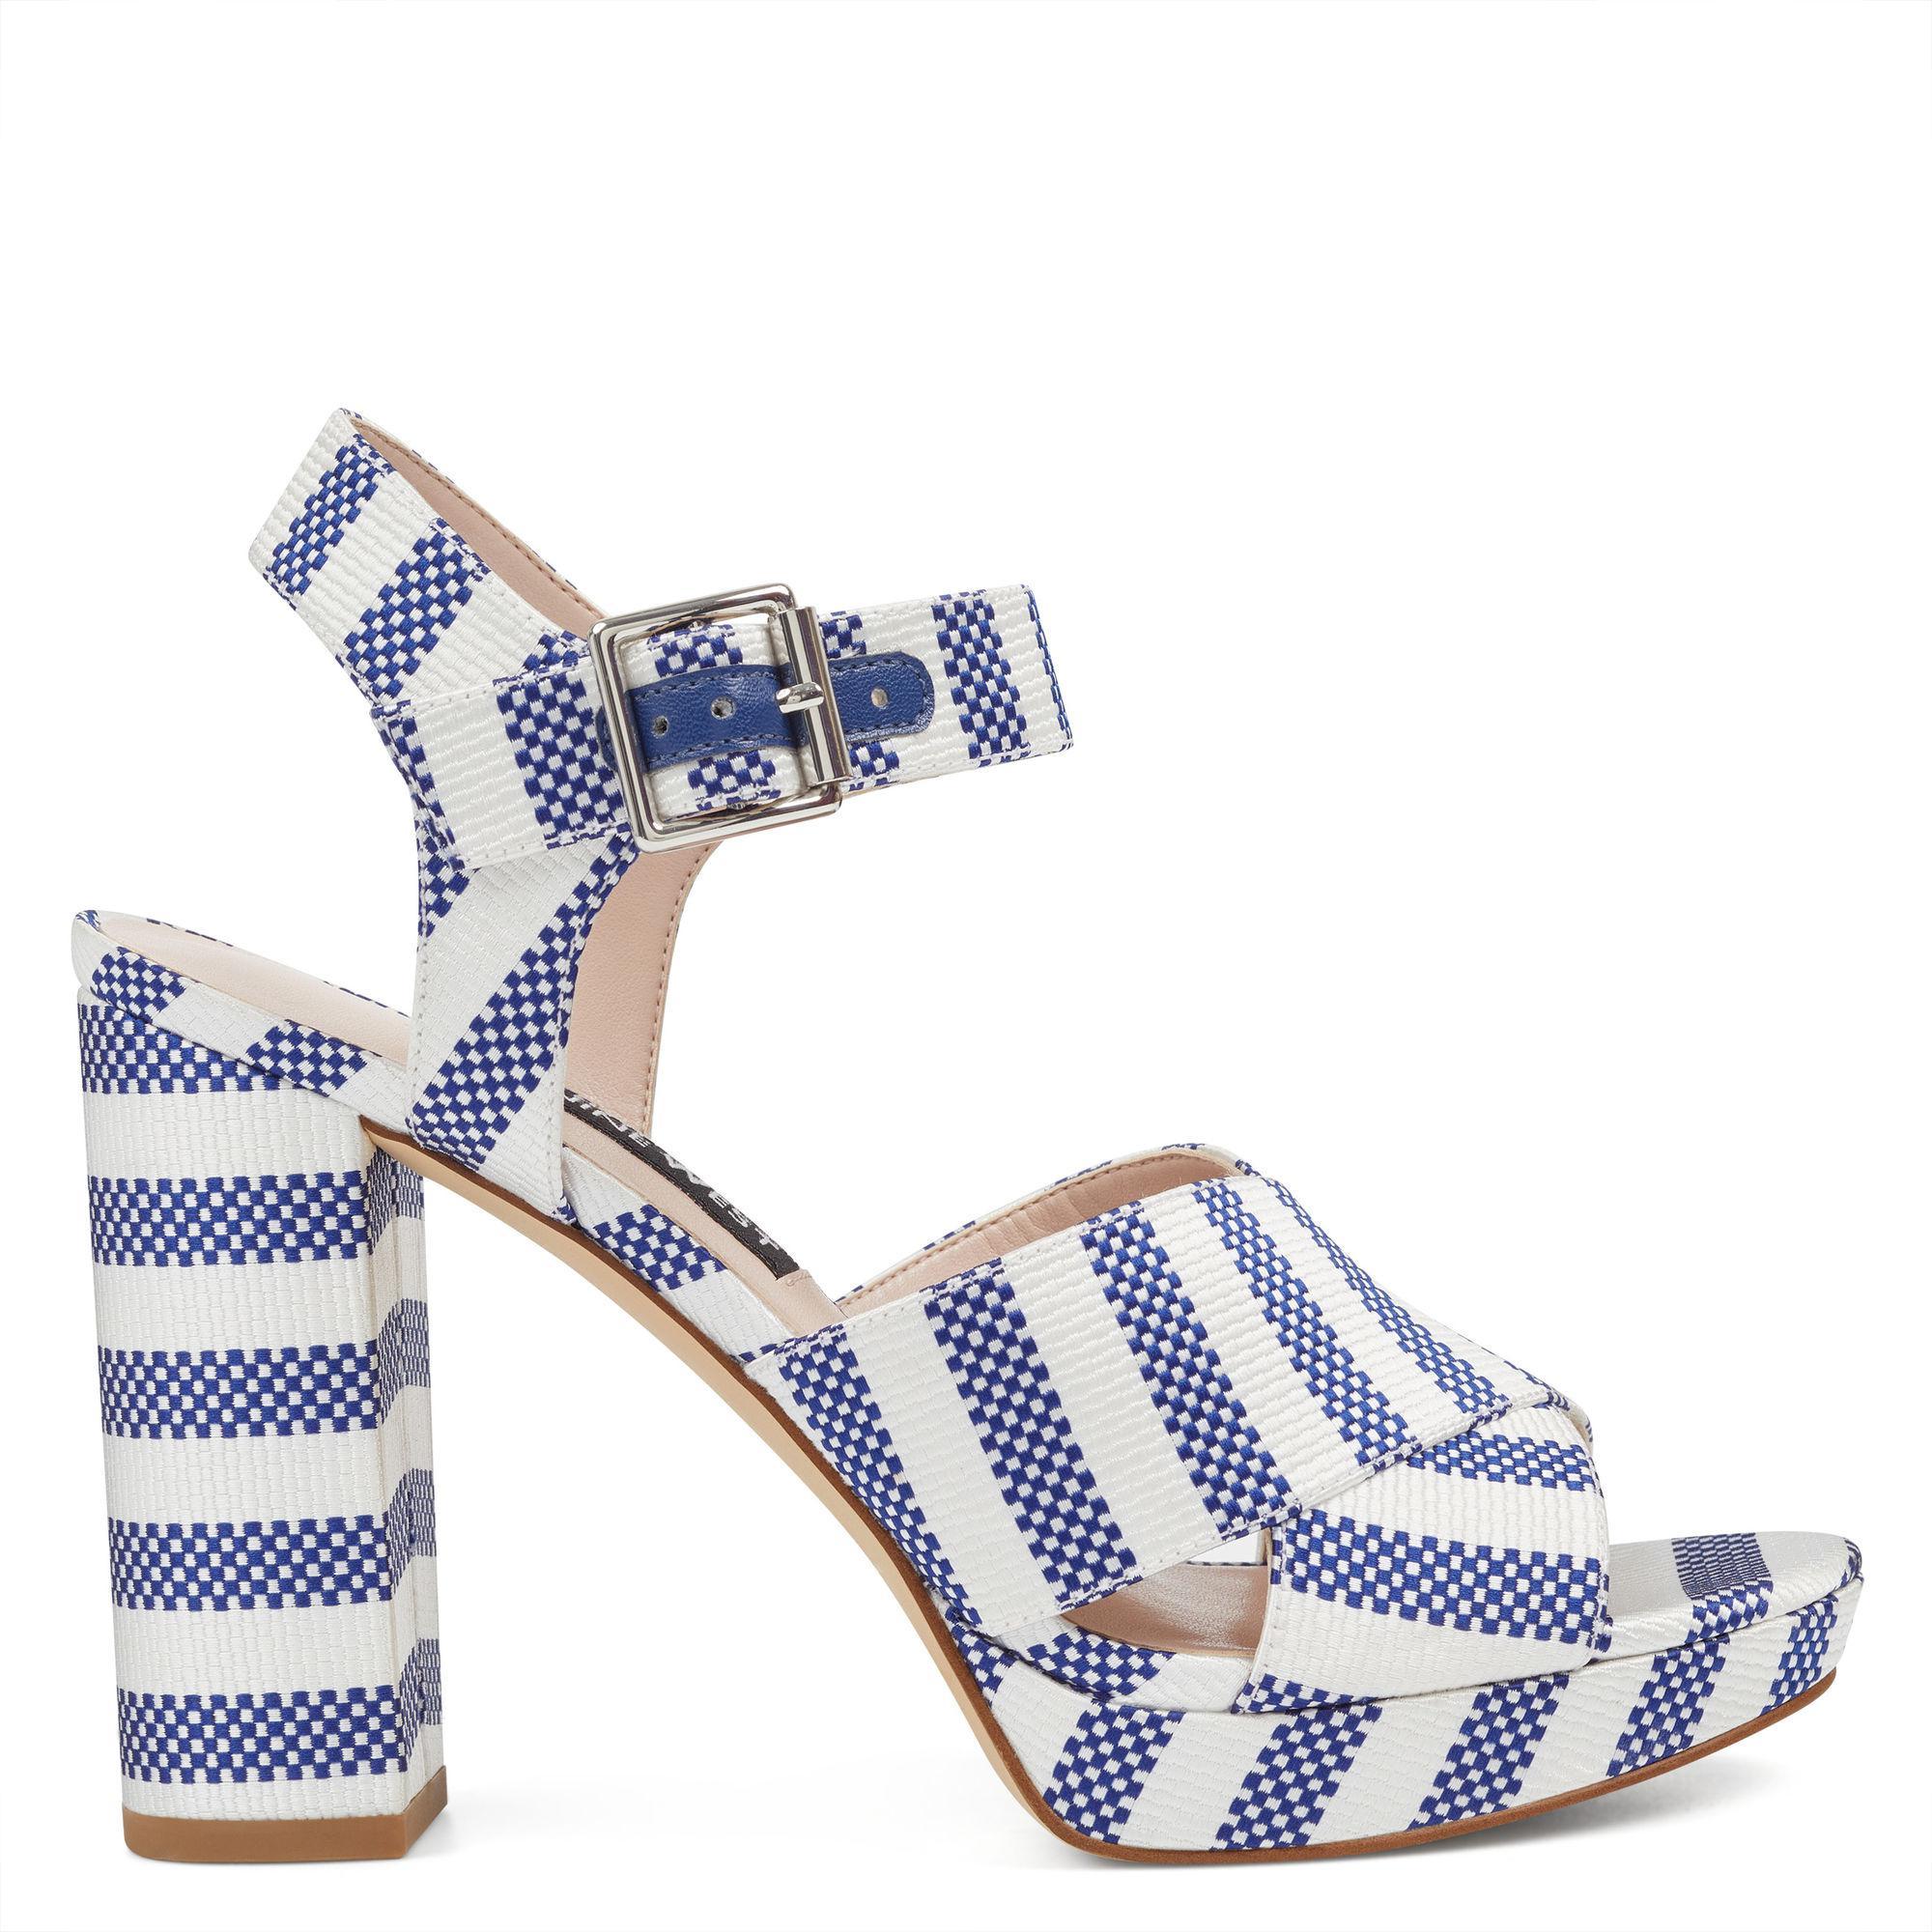 c6a8c54967f7 Lyst - Nine West Jimar Ankle-strap Platform Sandals in Blue